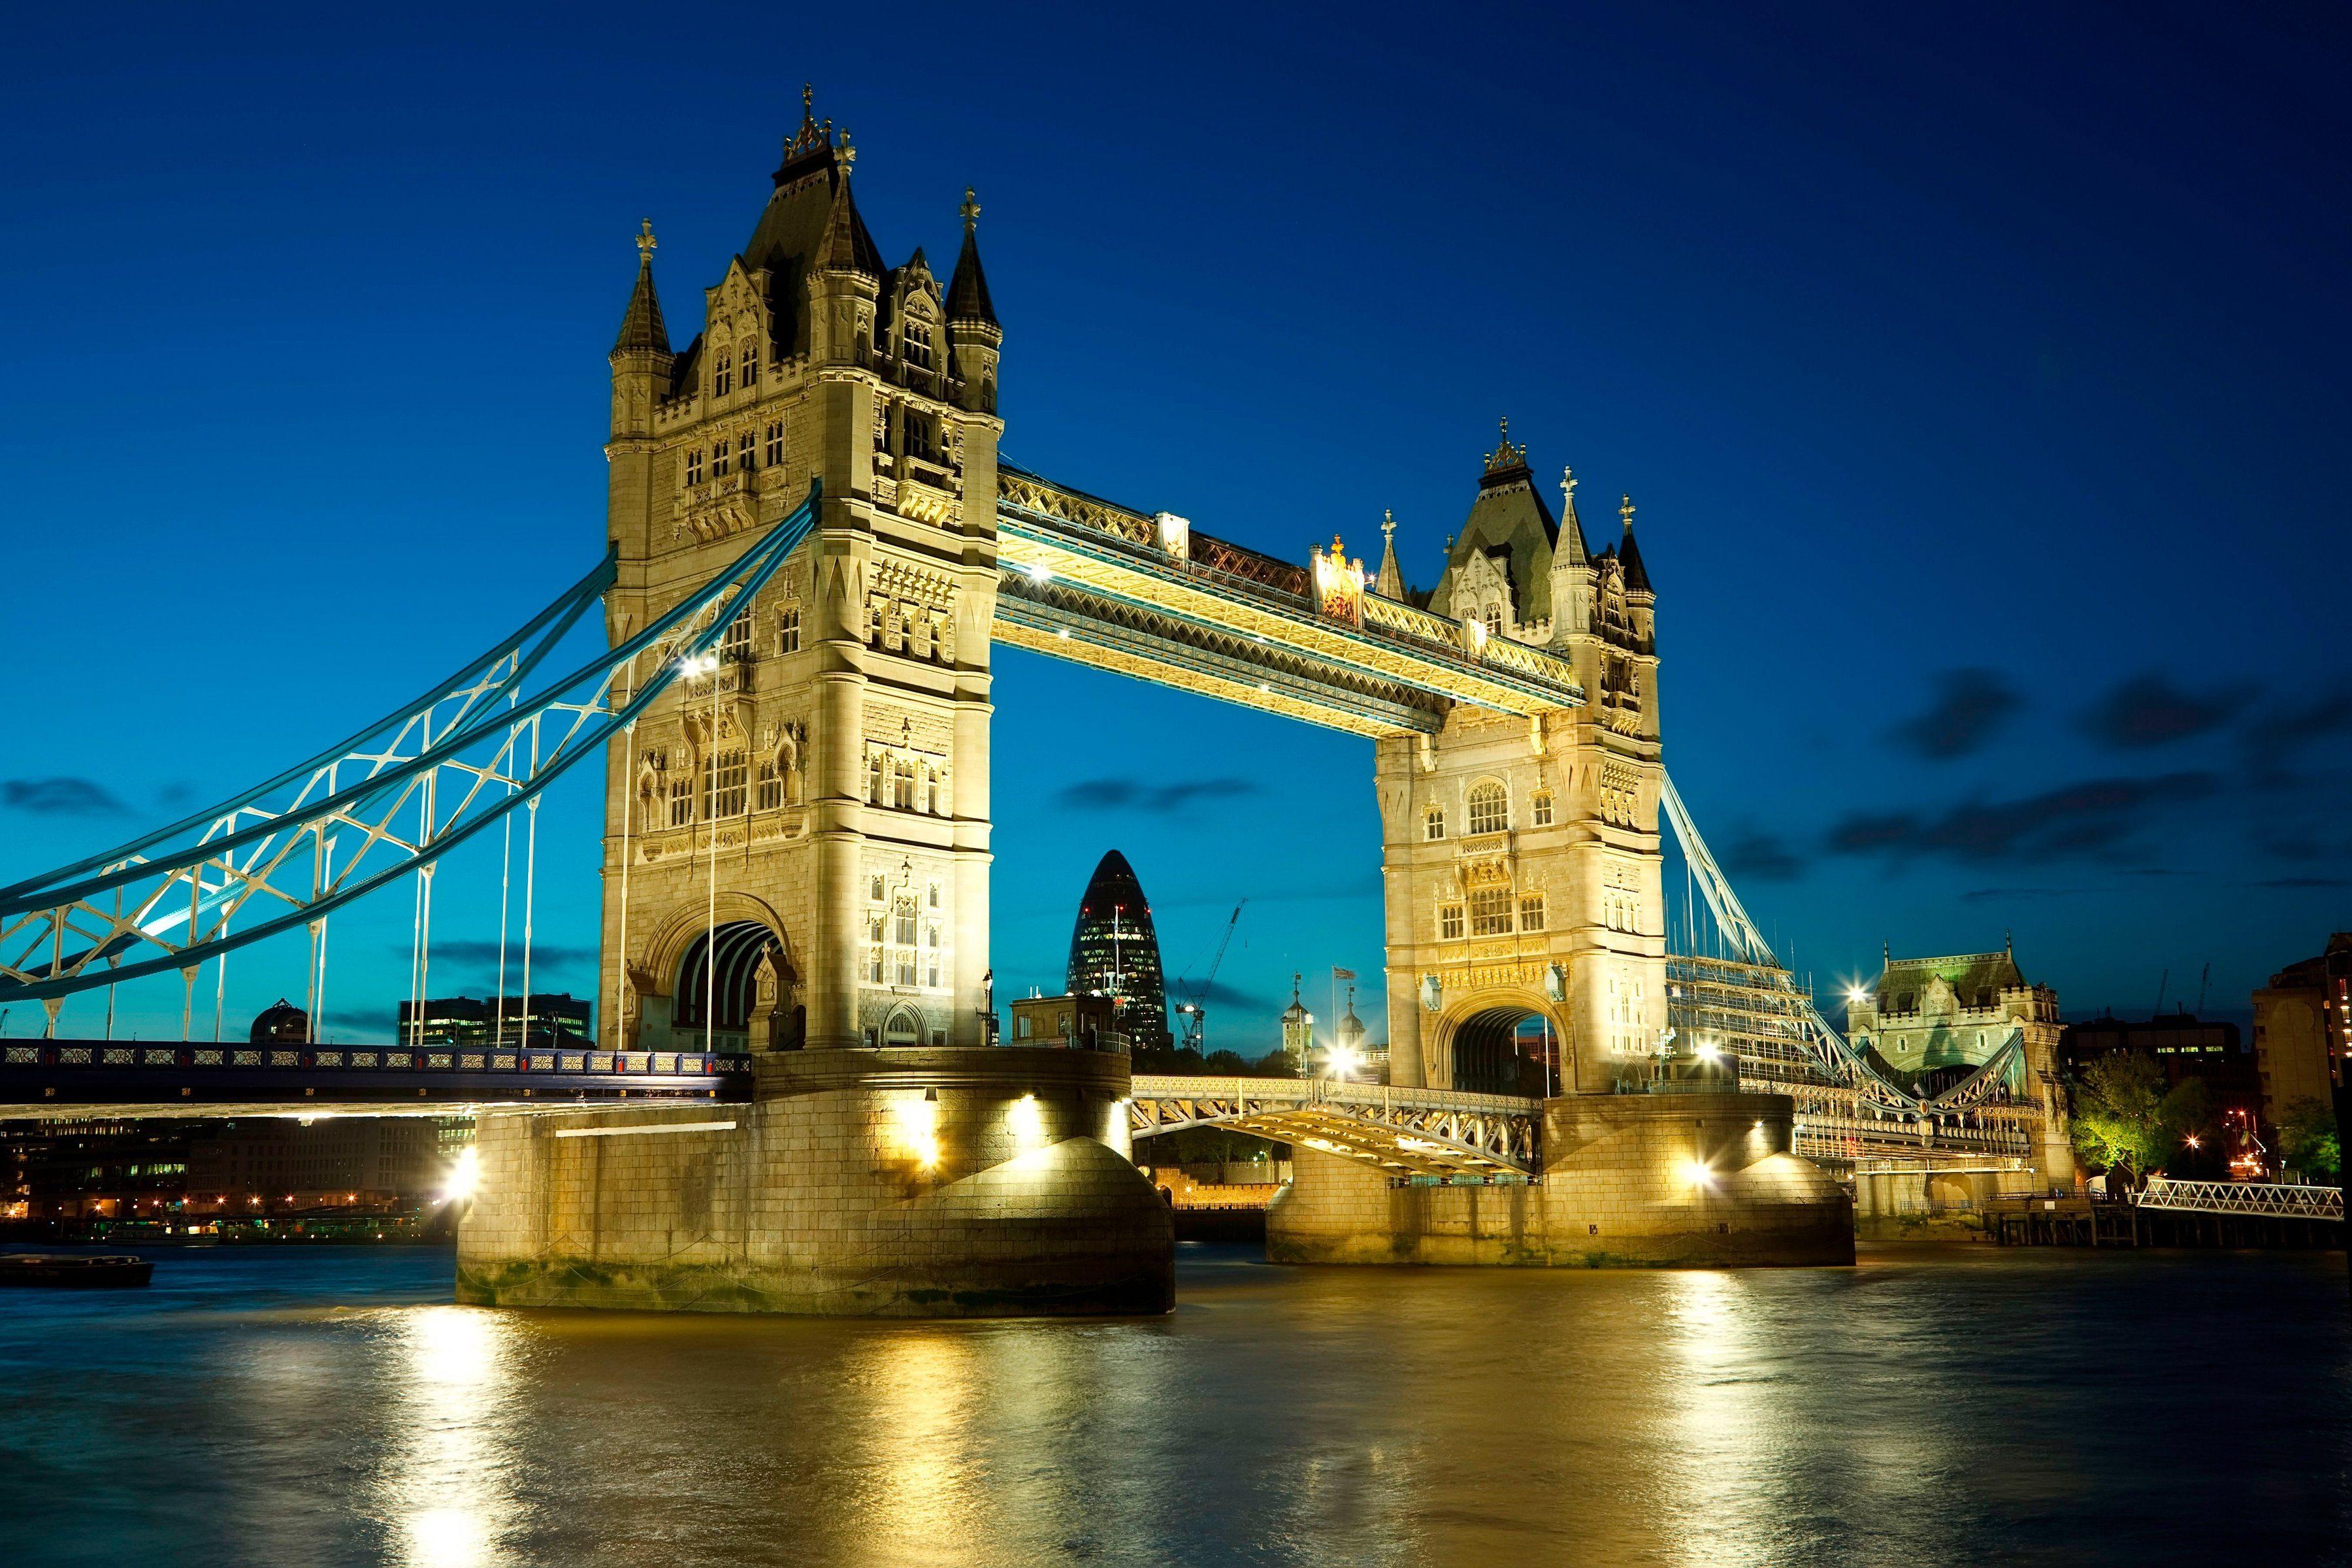 PAPERMOON Fototapete »Tower Bridge«, BlueBack, 7 Bahnen, 350 x 260 cm